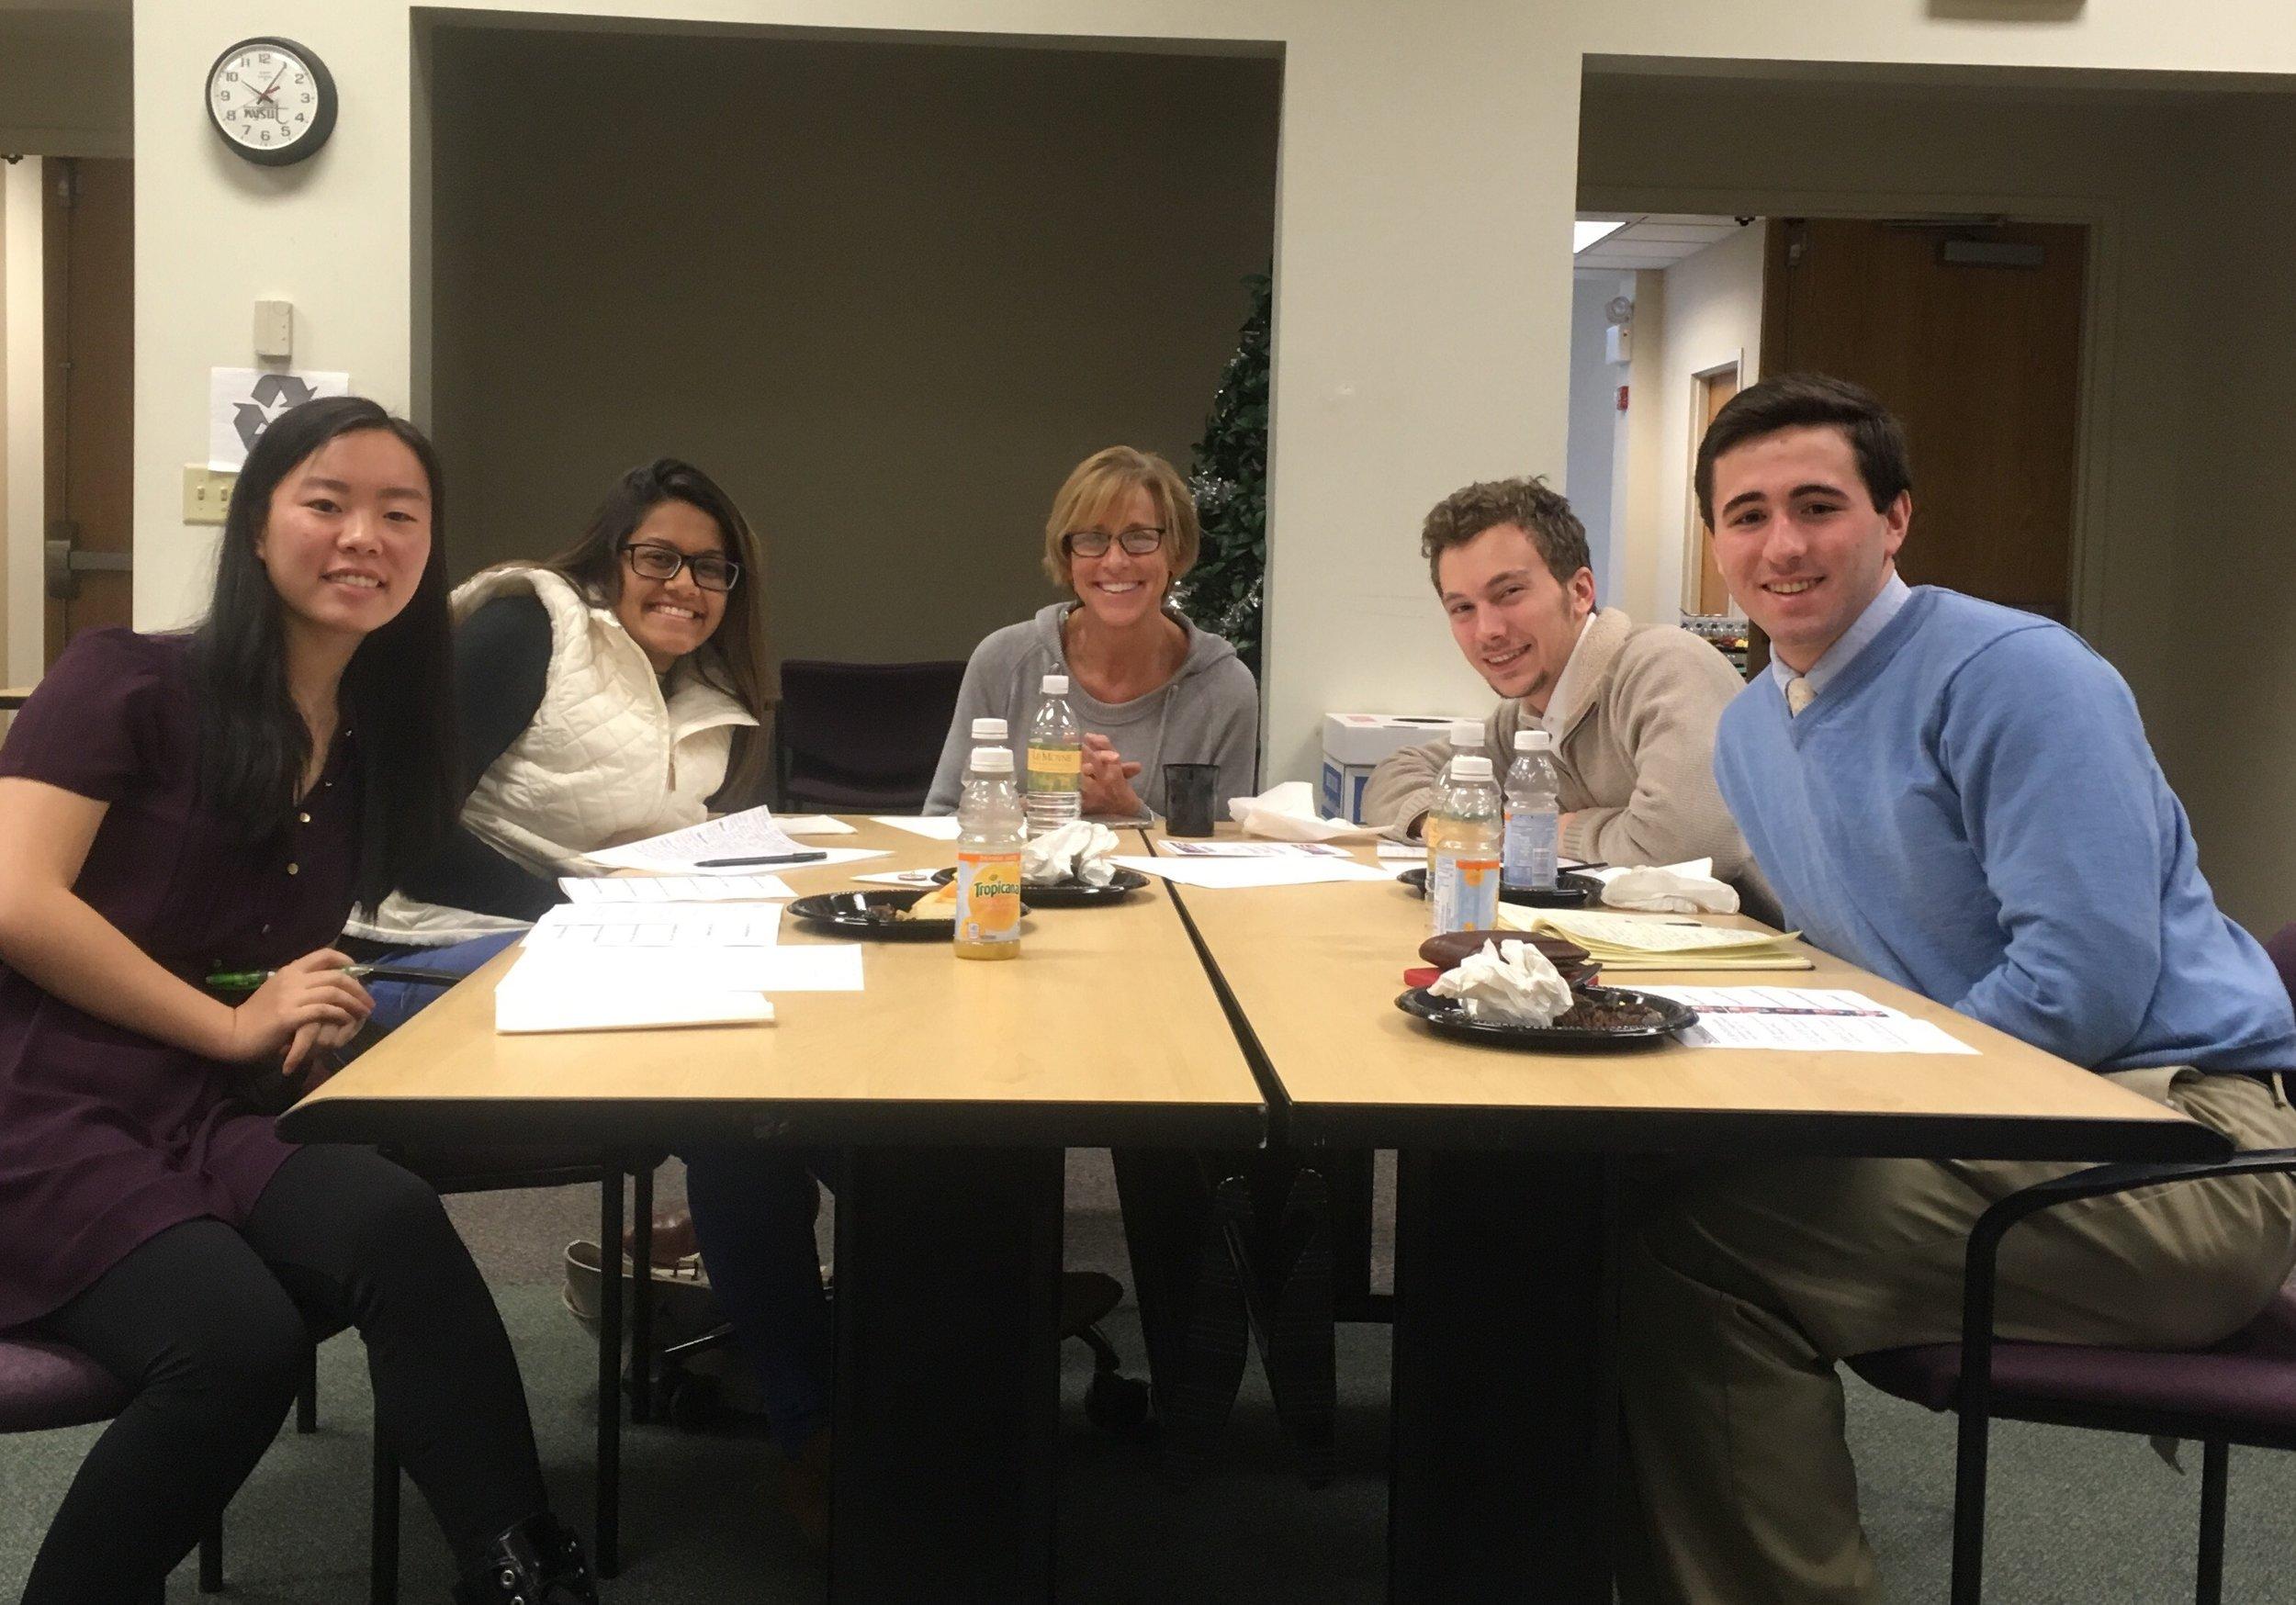 (From left to right) Michelle Pan (senior), Jenny Hossain (senior), Donna Oppedisano (teacher), Seth Blair (senior), Thomas Edson (senior) at the NYSUT Legislative Breakfast